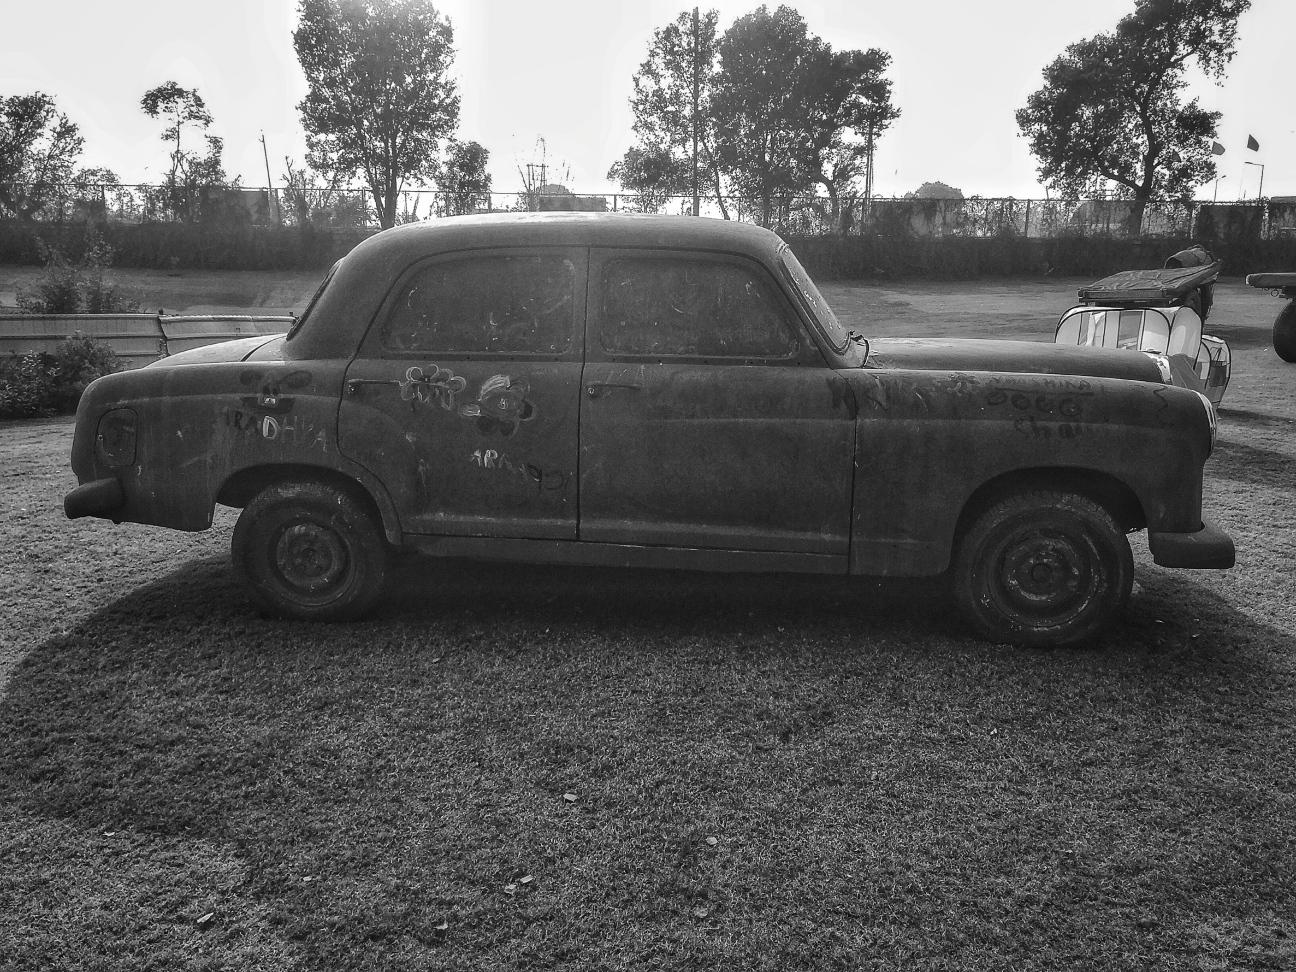 Vintage Monochrome